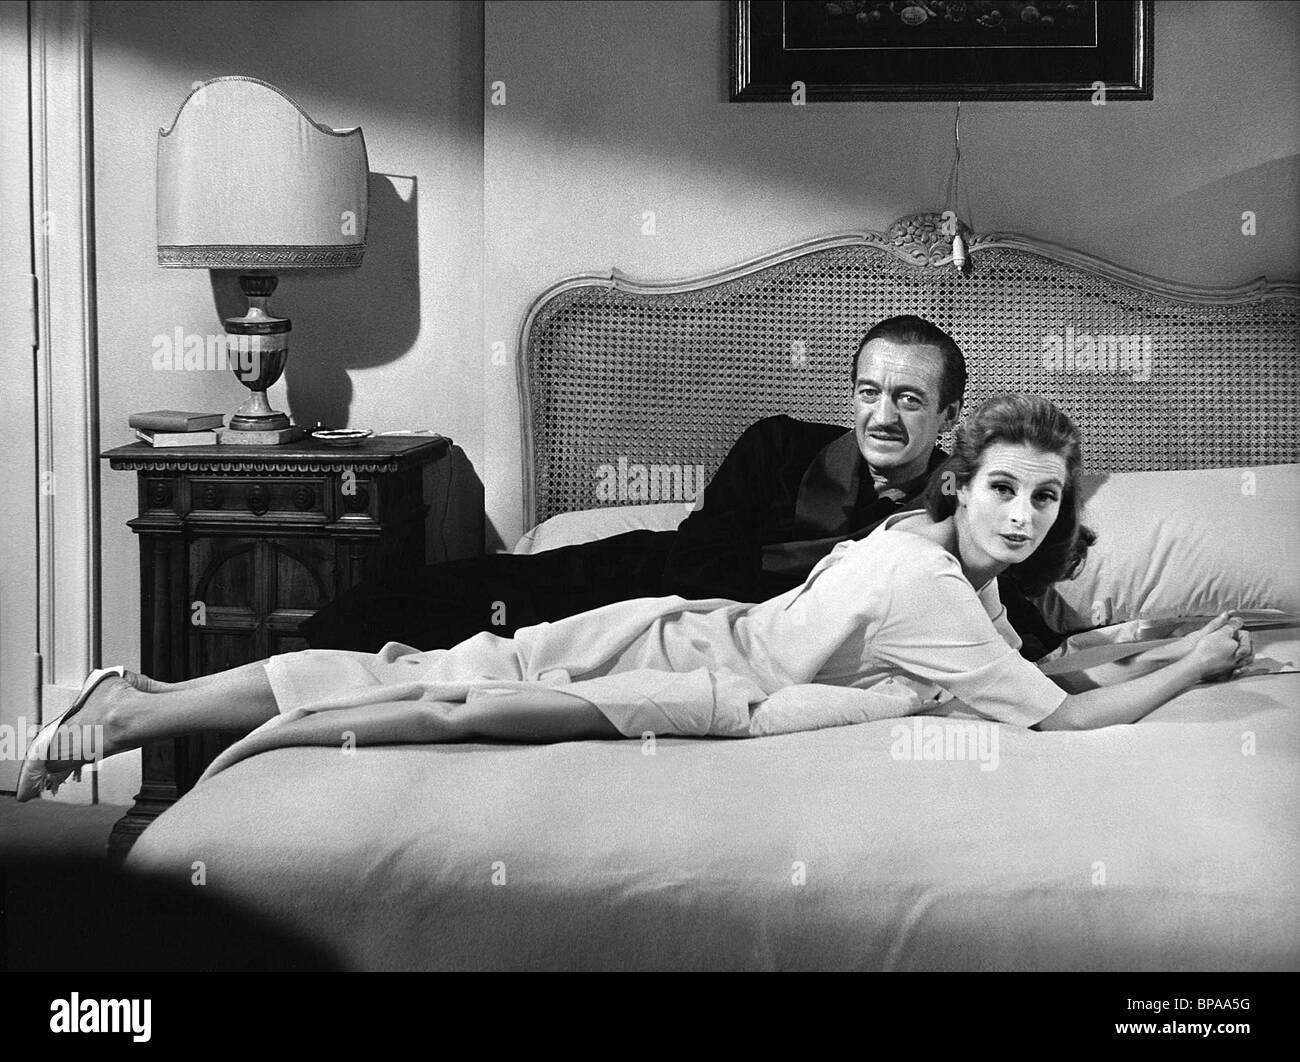 d66236183c17 DAVID NIVEN, CAPUCINE, THE PINK PANTHER, 1963 Stock Photo: 30960316 ...